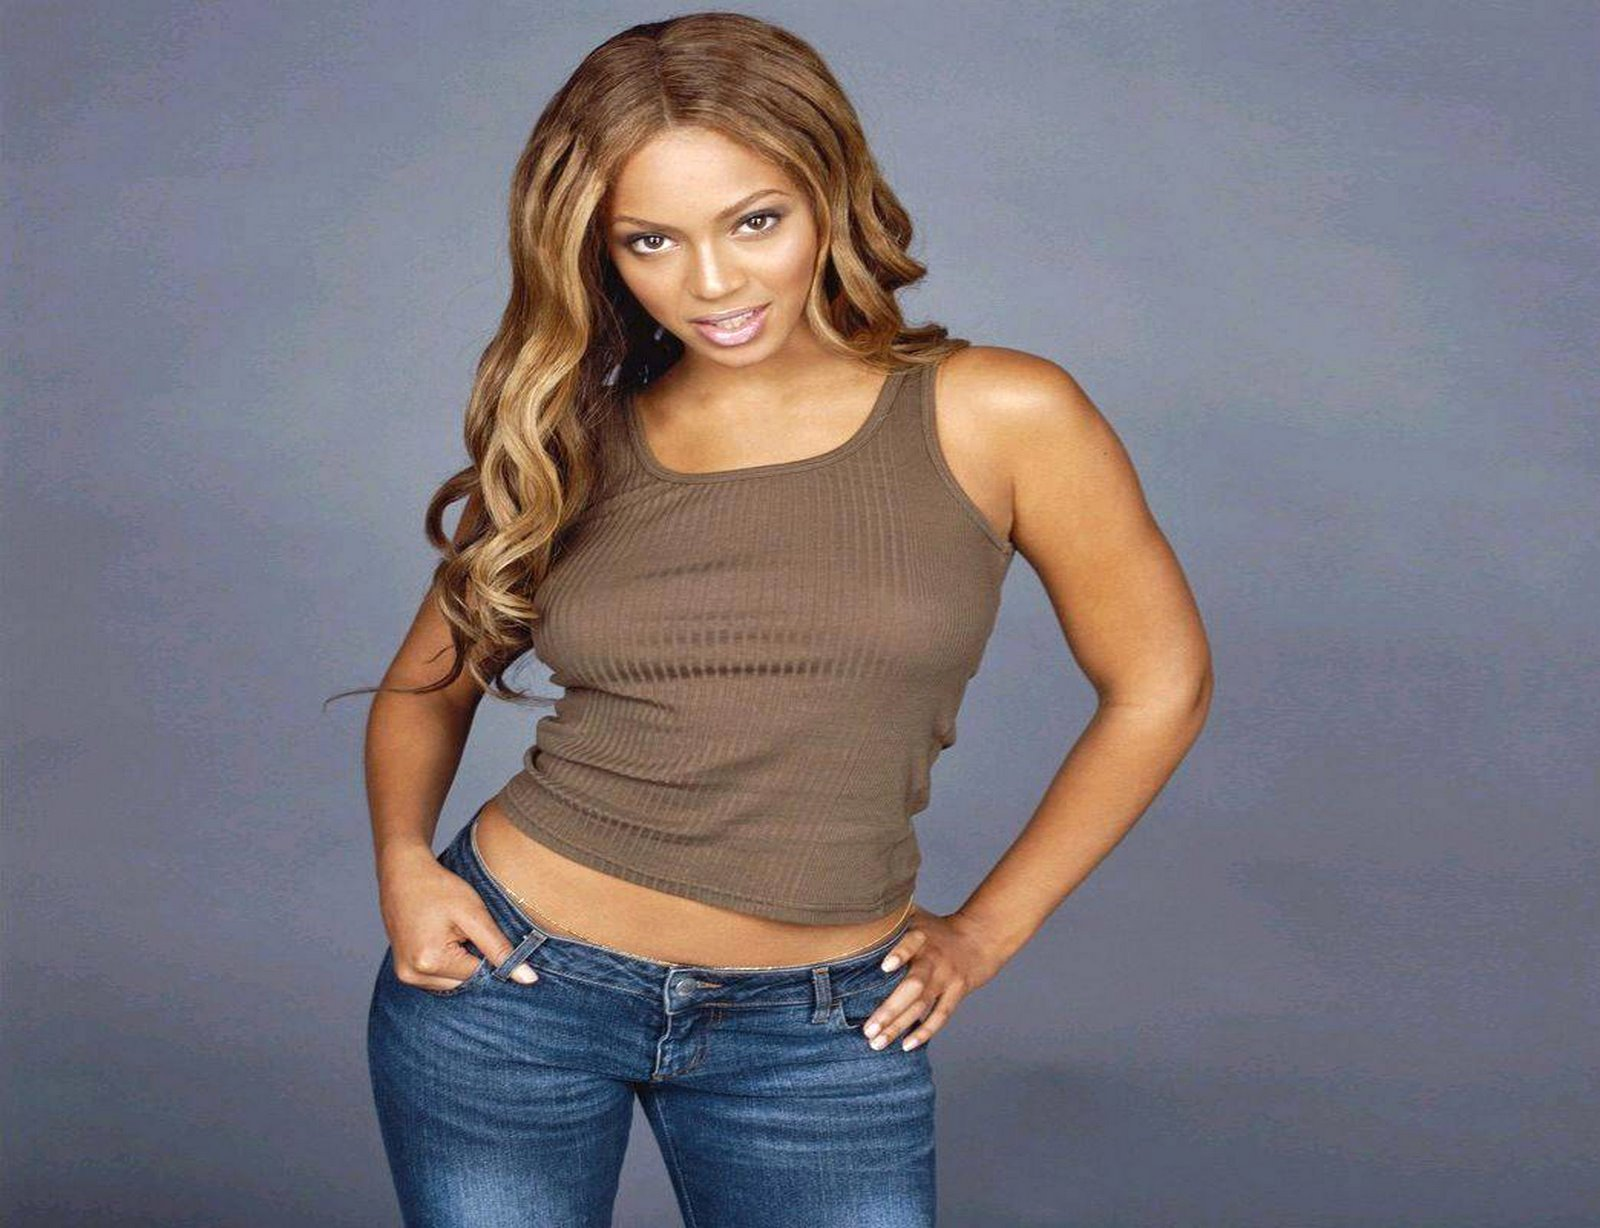 http://2.bp.blogspot.com/_kz5tggJUhu8/Ry8NP18plnI/AAAAAAAAAFk/gY35_zZmrWs/s1600/Beyonce+Knowles+2.jpg